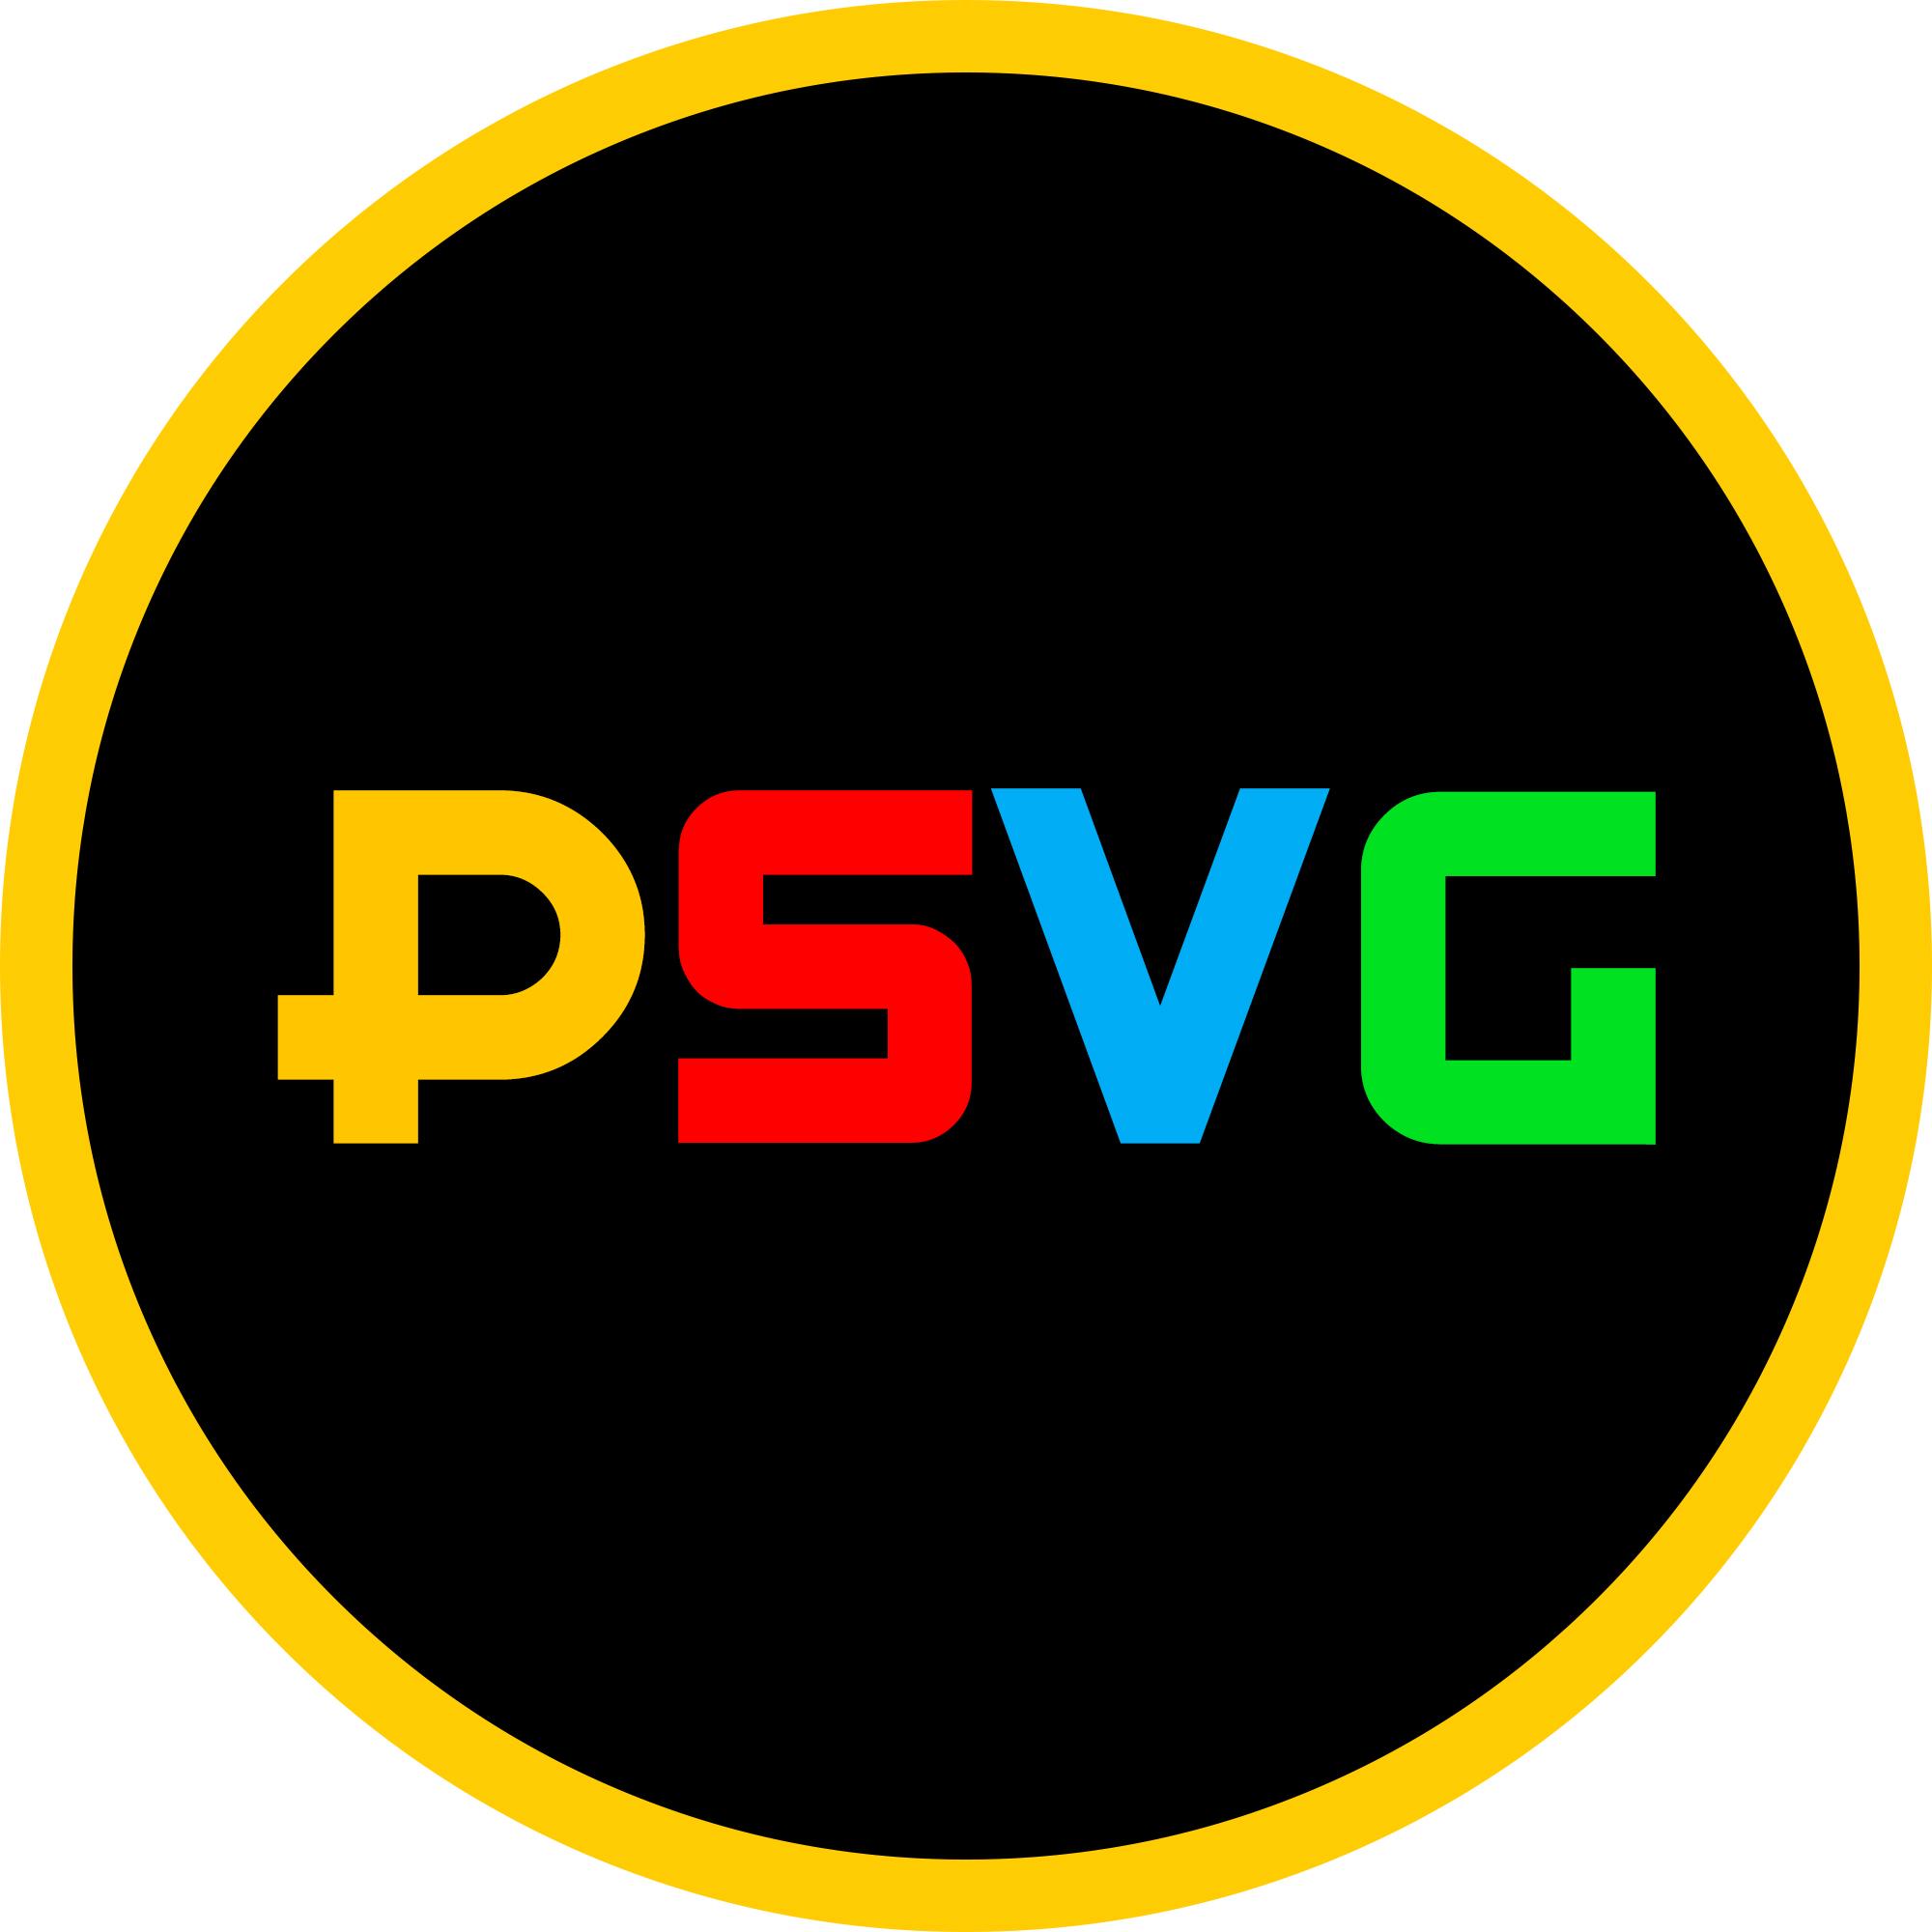 PSVG 136 - Dynamic Duets